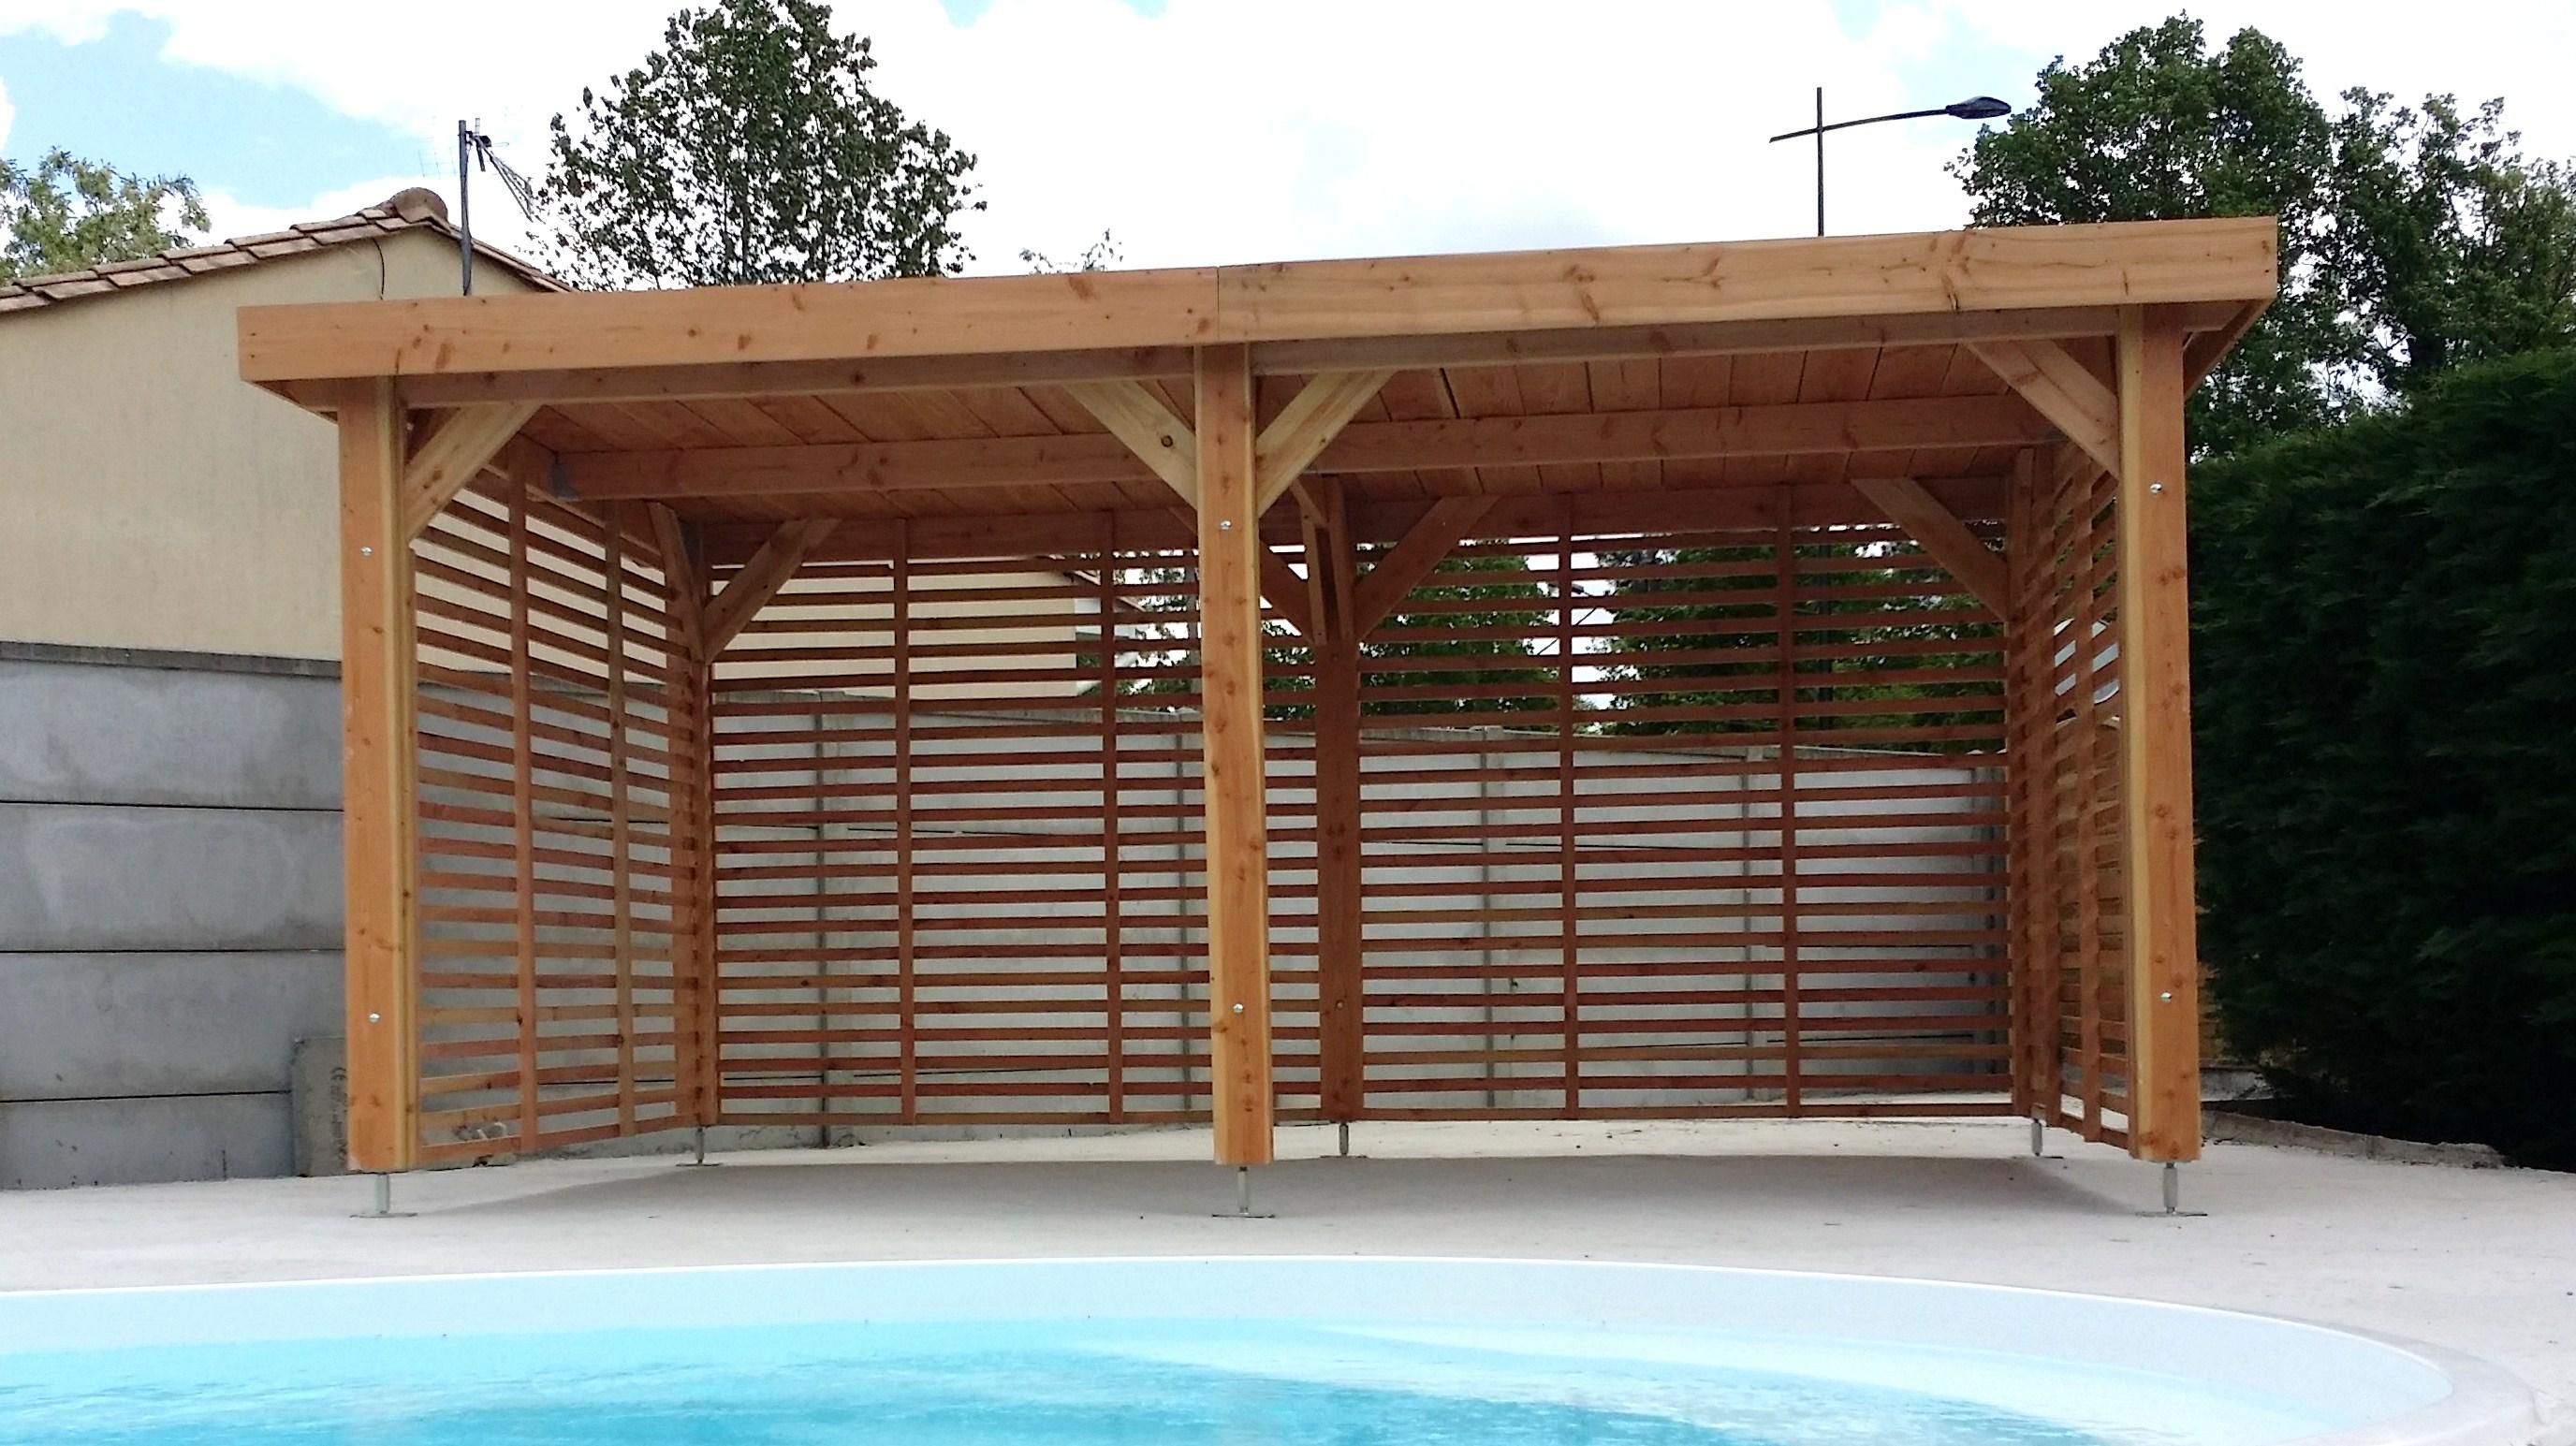 Agrandir sa maison en ossature bois penser construire for Agrandir maison bois